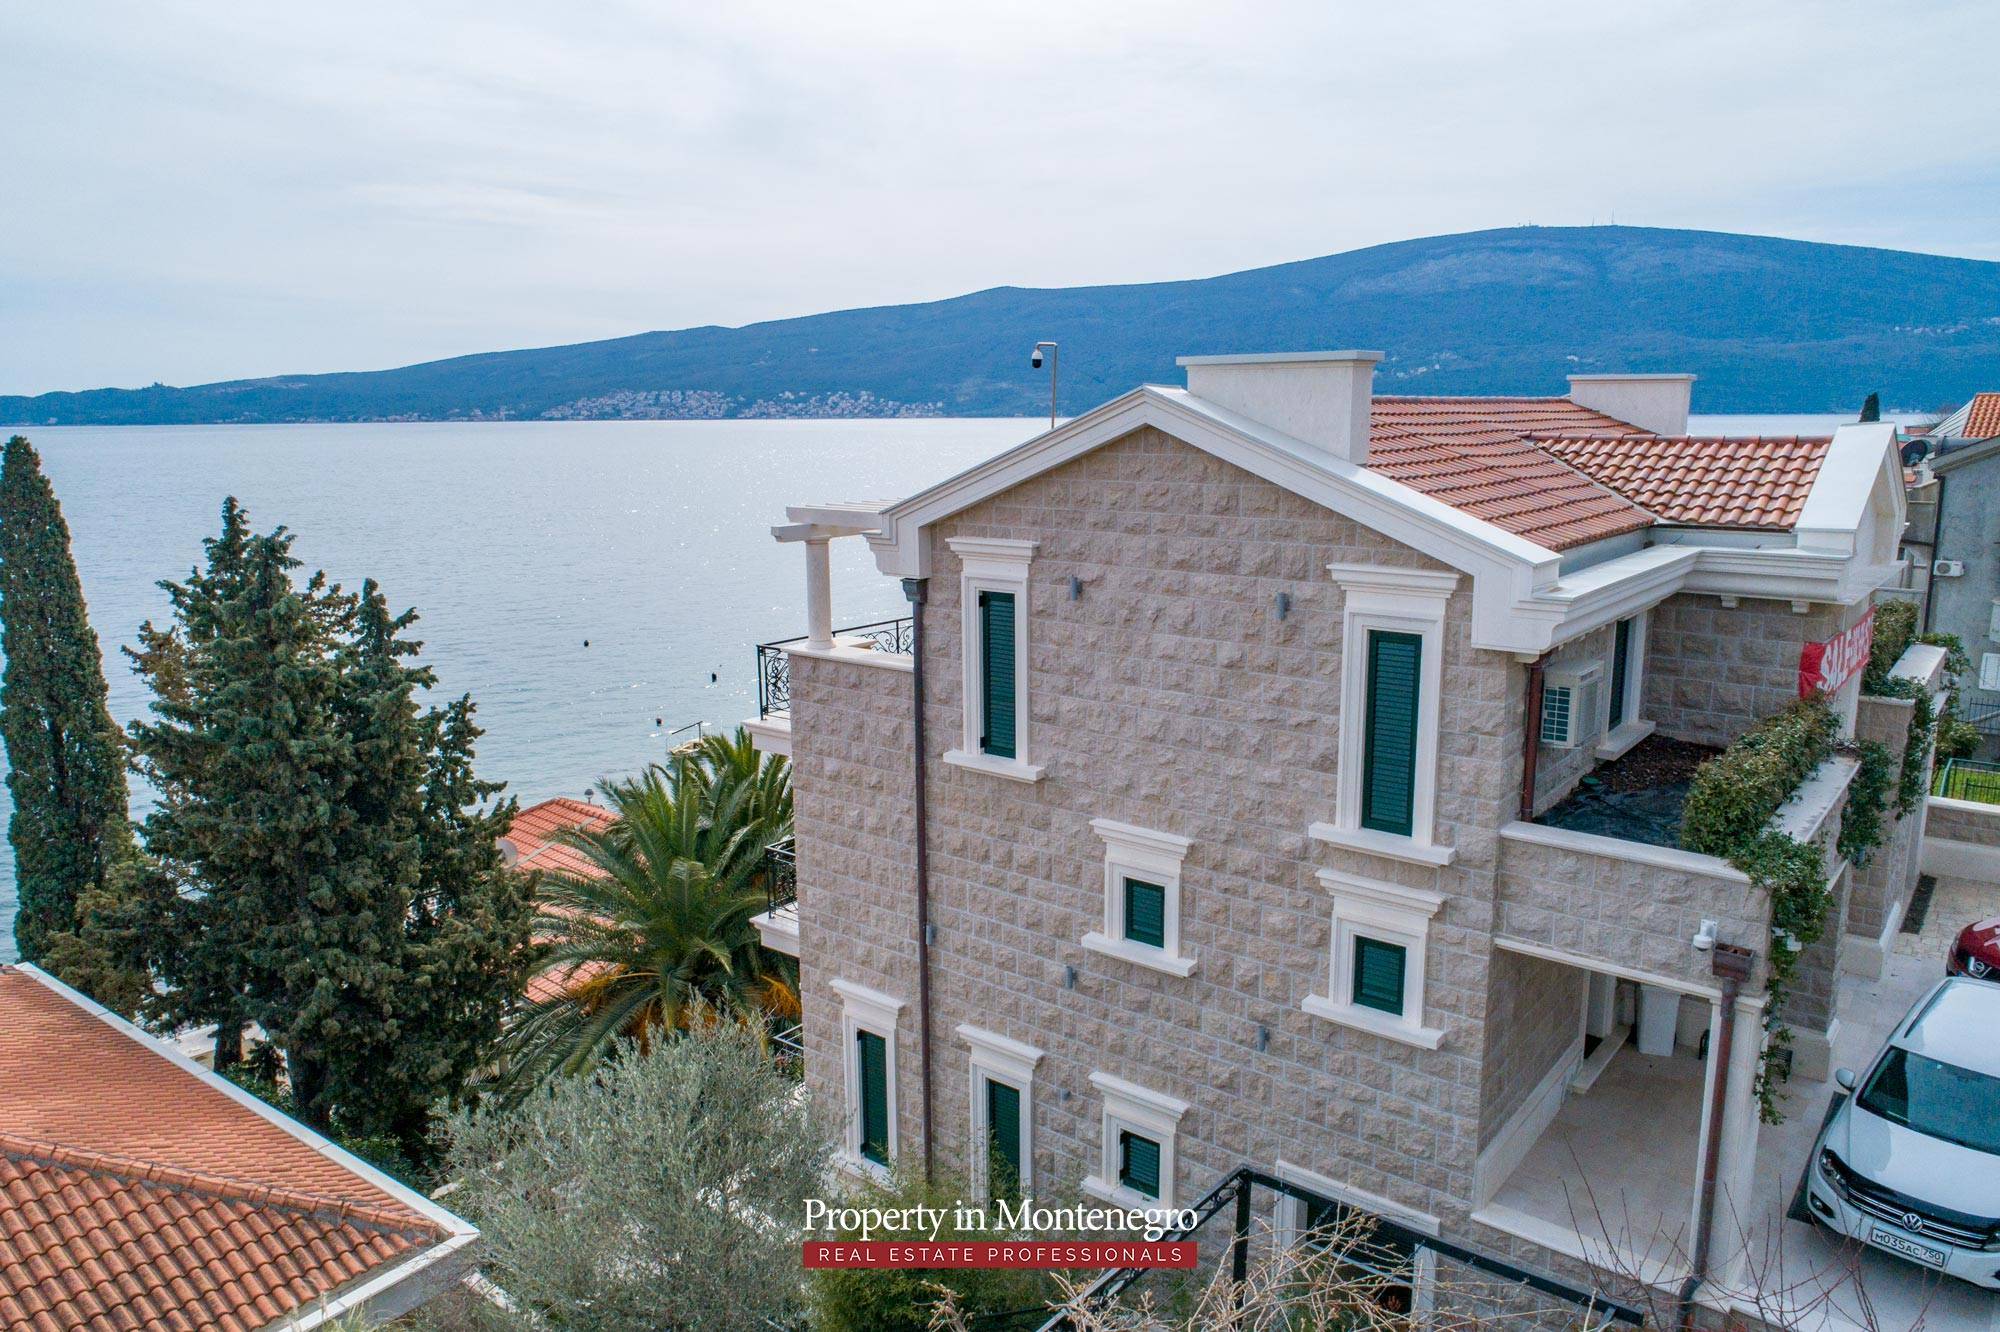 Luxury-waterfront-villa-for-sale-in-Montenegro (20).jpg